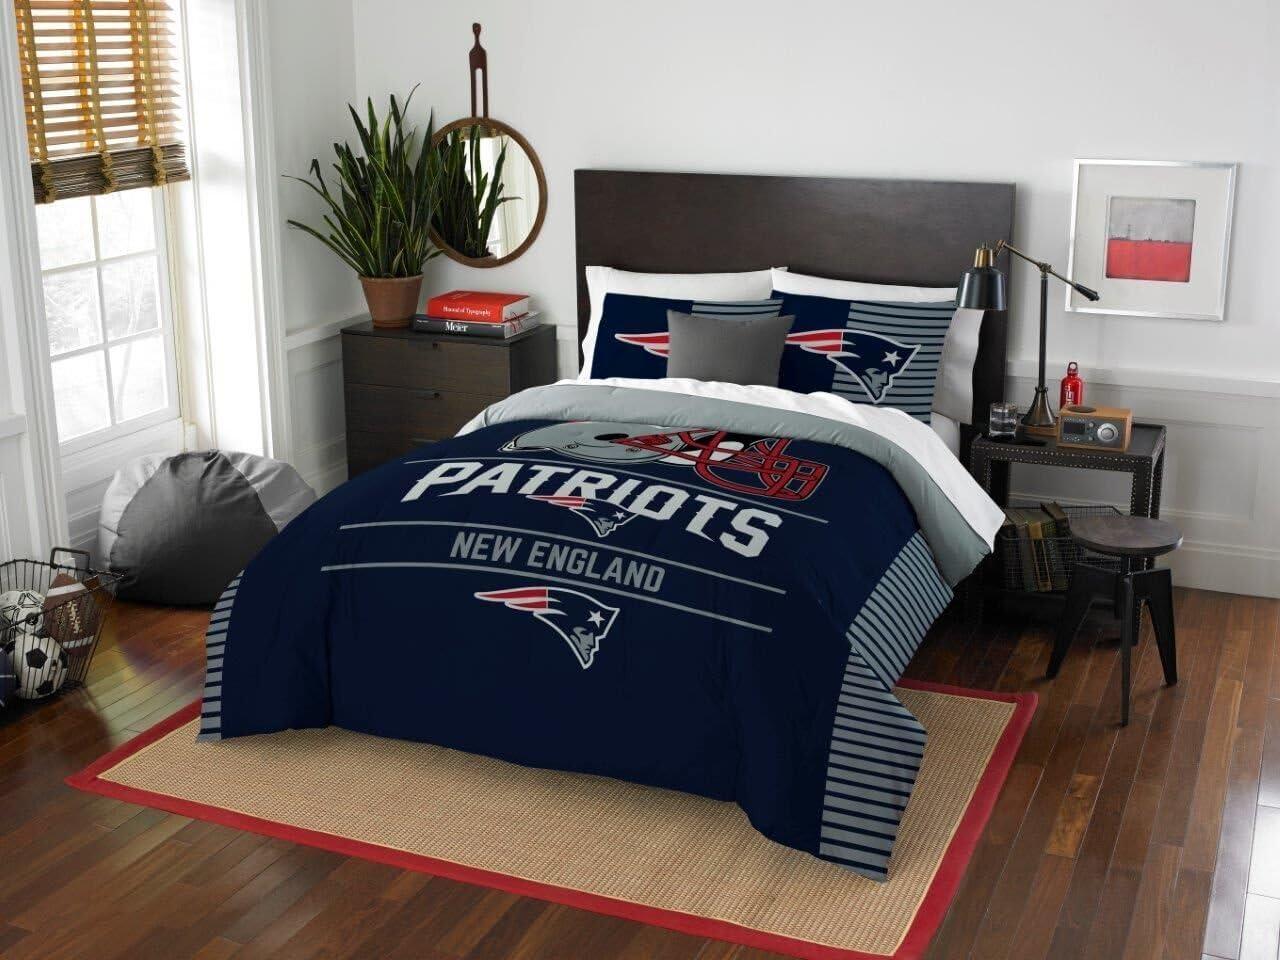 "New England Patriots - 3 Piece FULL / QUEEN Size Printed Comforter Set - Entire Set Includes: 1 Full / Queen Comforter (86"" x 86"") & 2 Pillow Shams - NFL Football Bedding Bedroom Accessories"